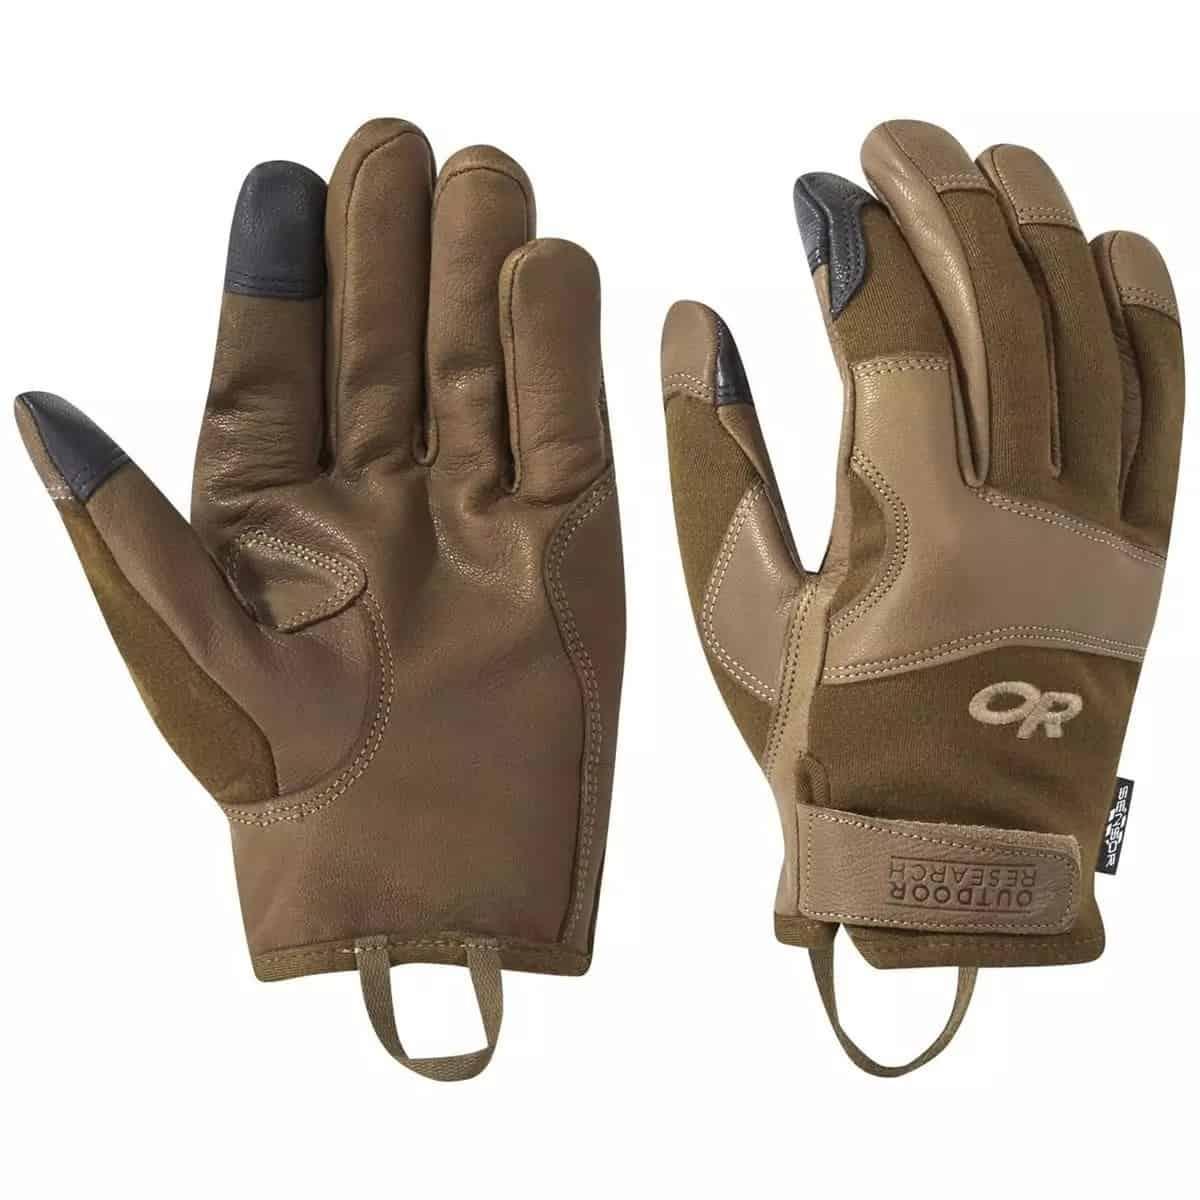 Outdoor Research Convoy Sensor Gloves